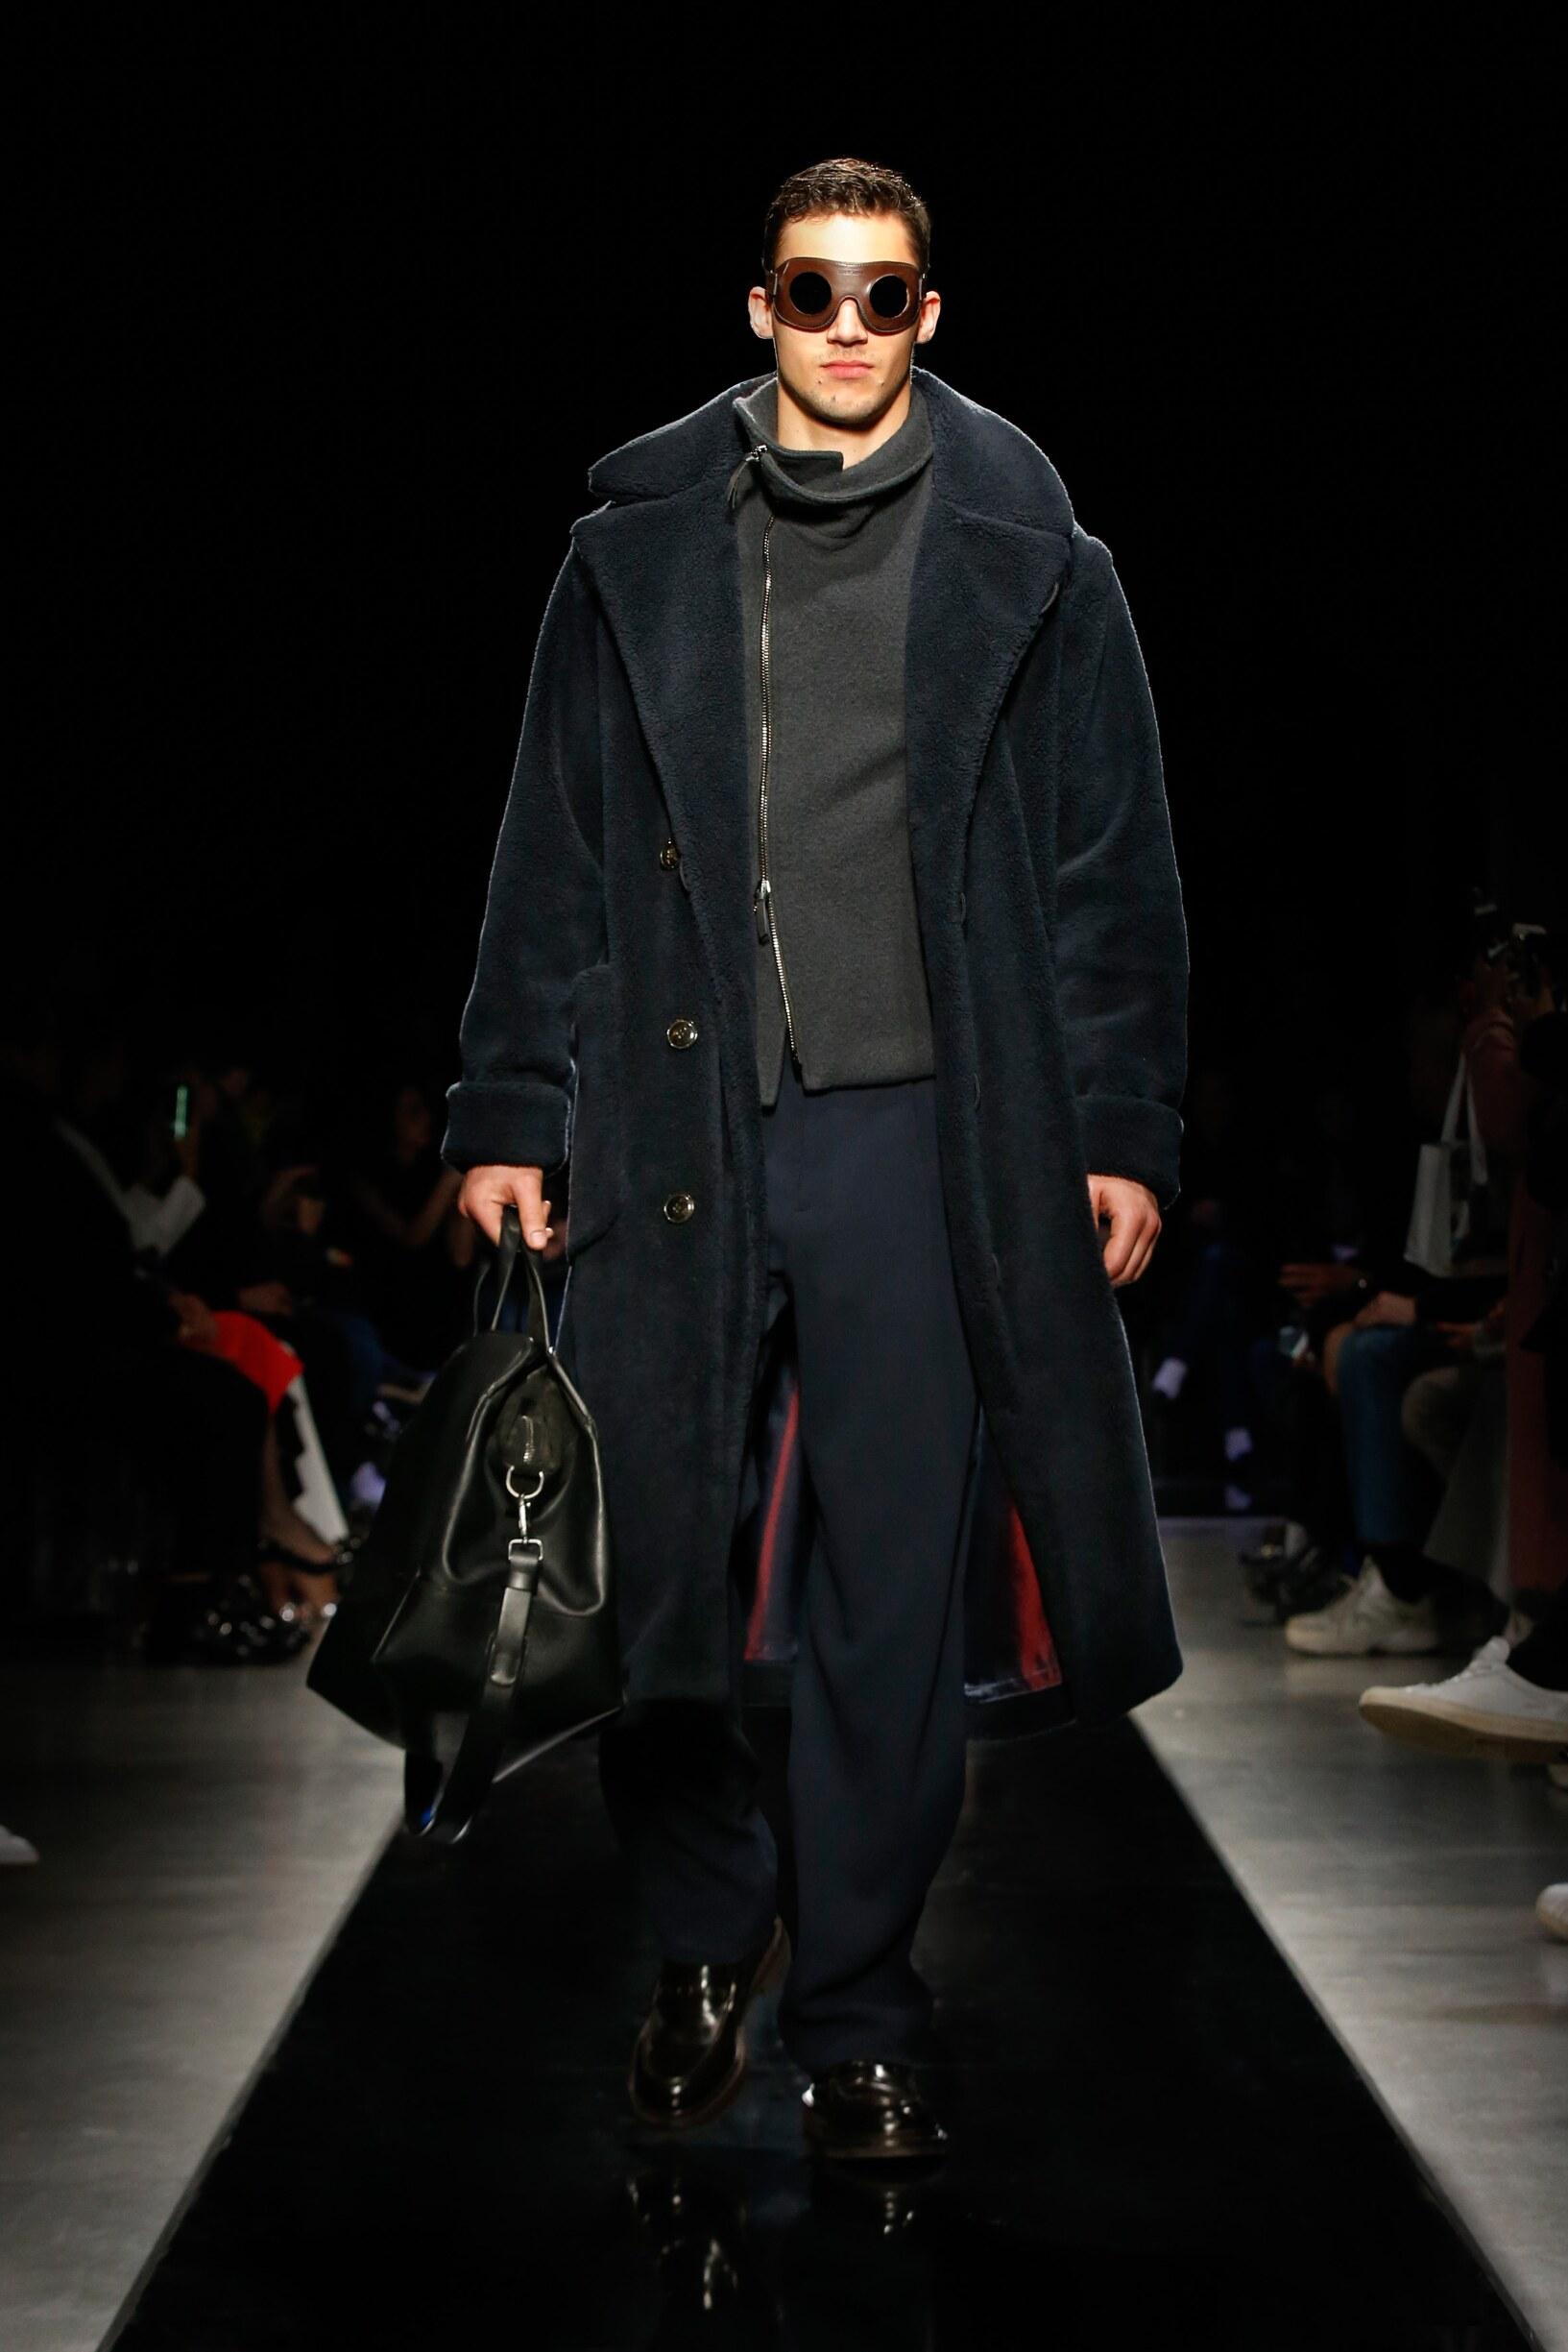 Fall 2019 Menswear Giorgio Armani